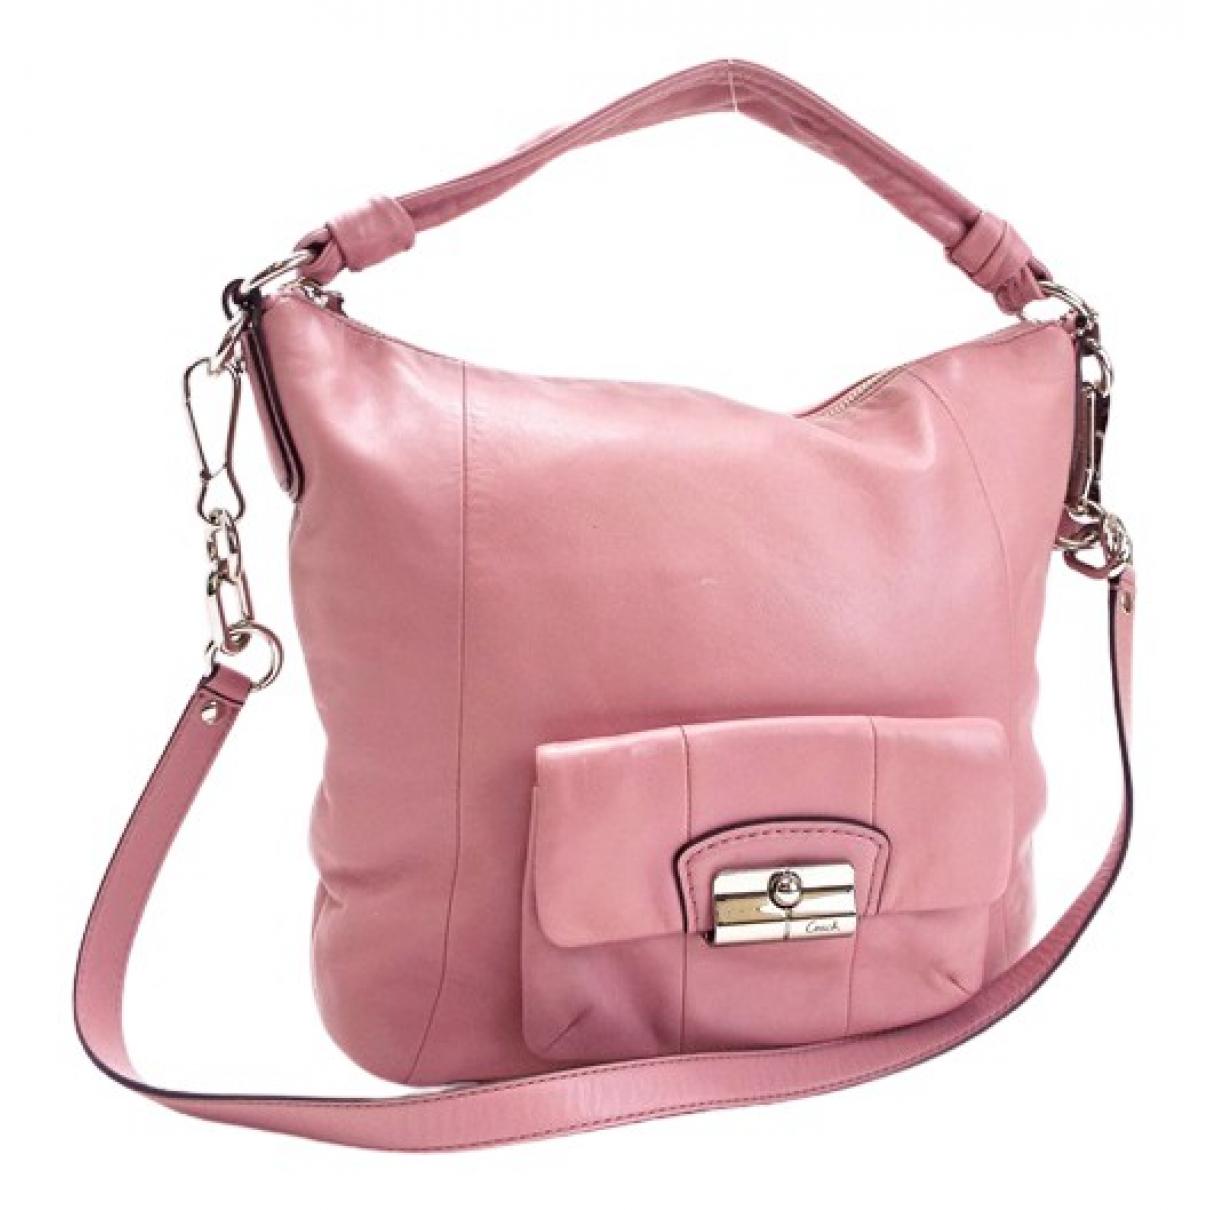 Coach N Pink Leather handbag for Women N